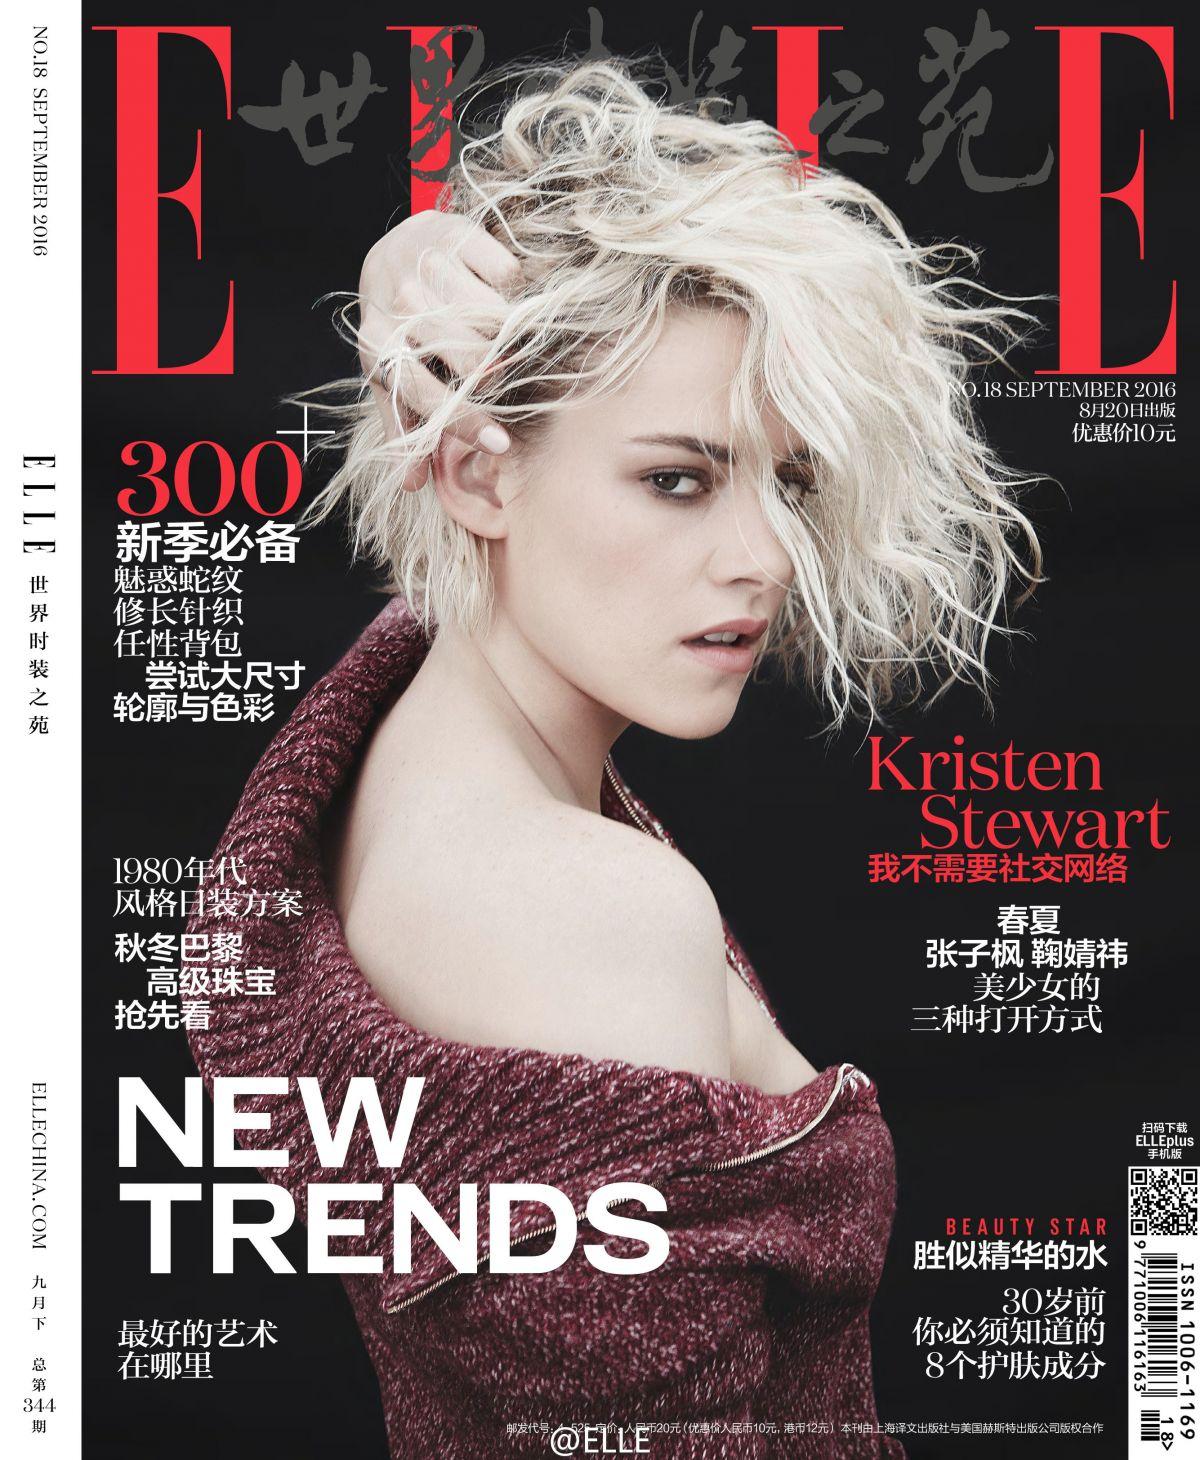 KRISTEN STEWART in Elle Magazine, China September 2016 Issue